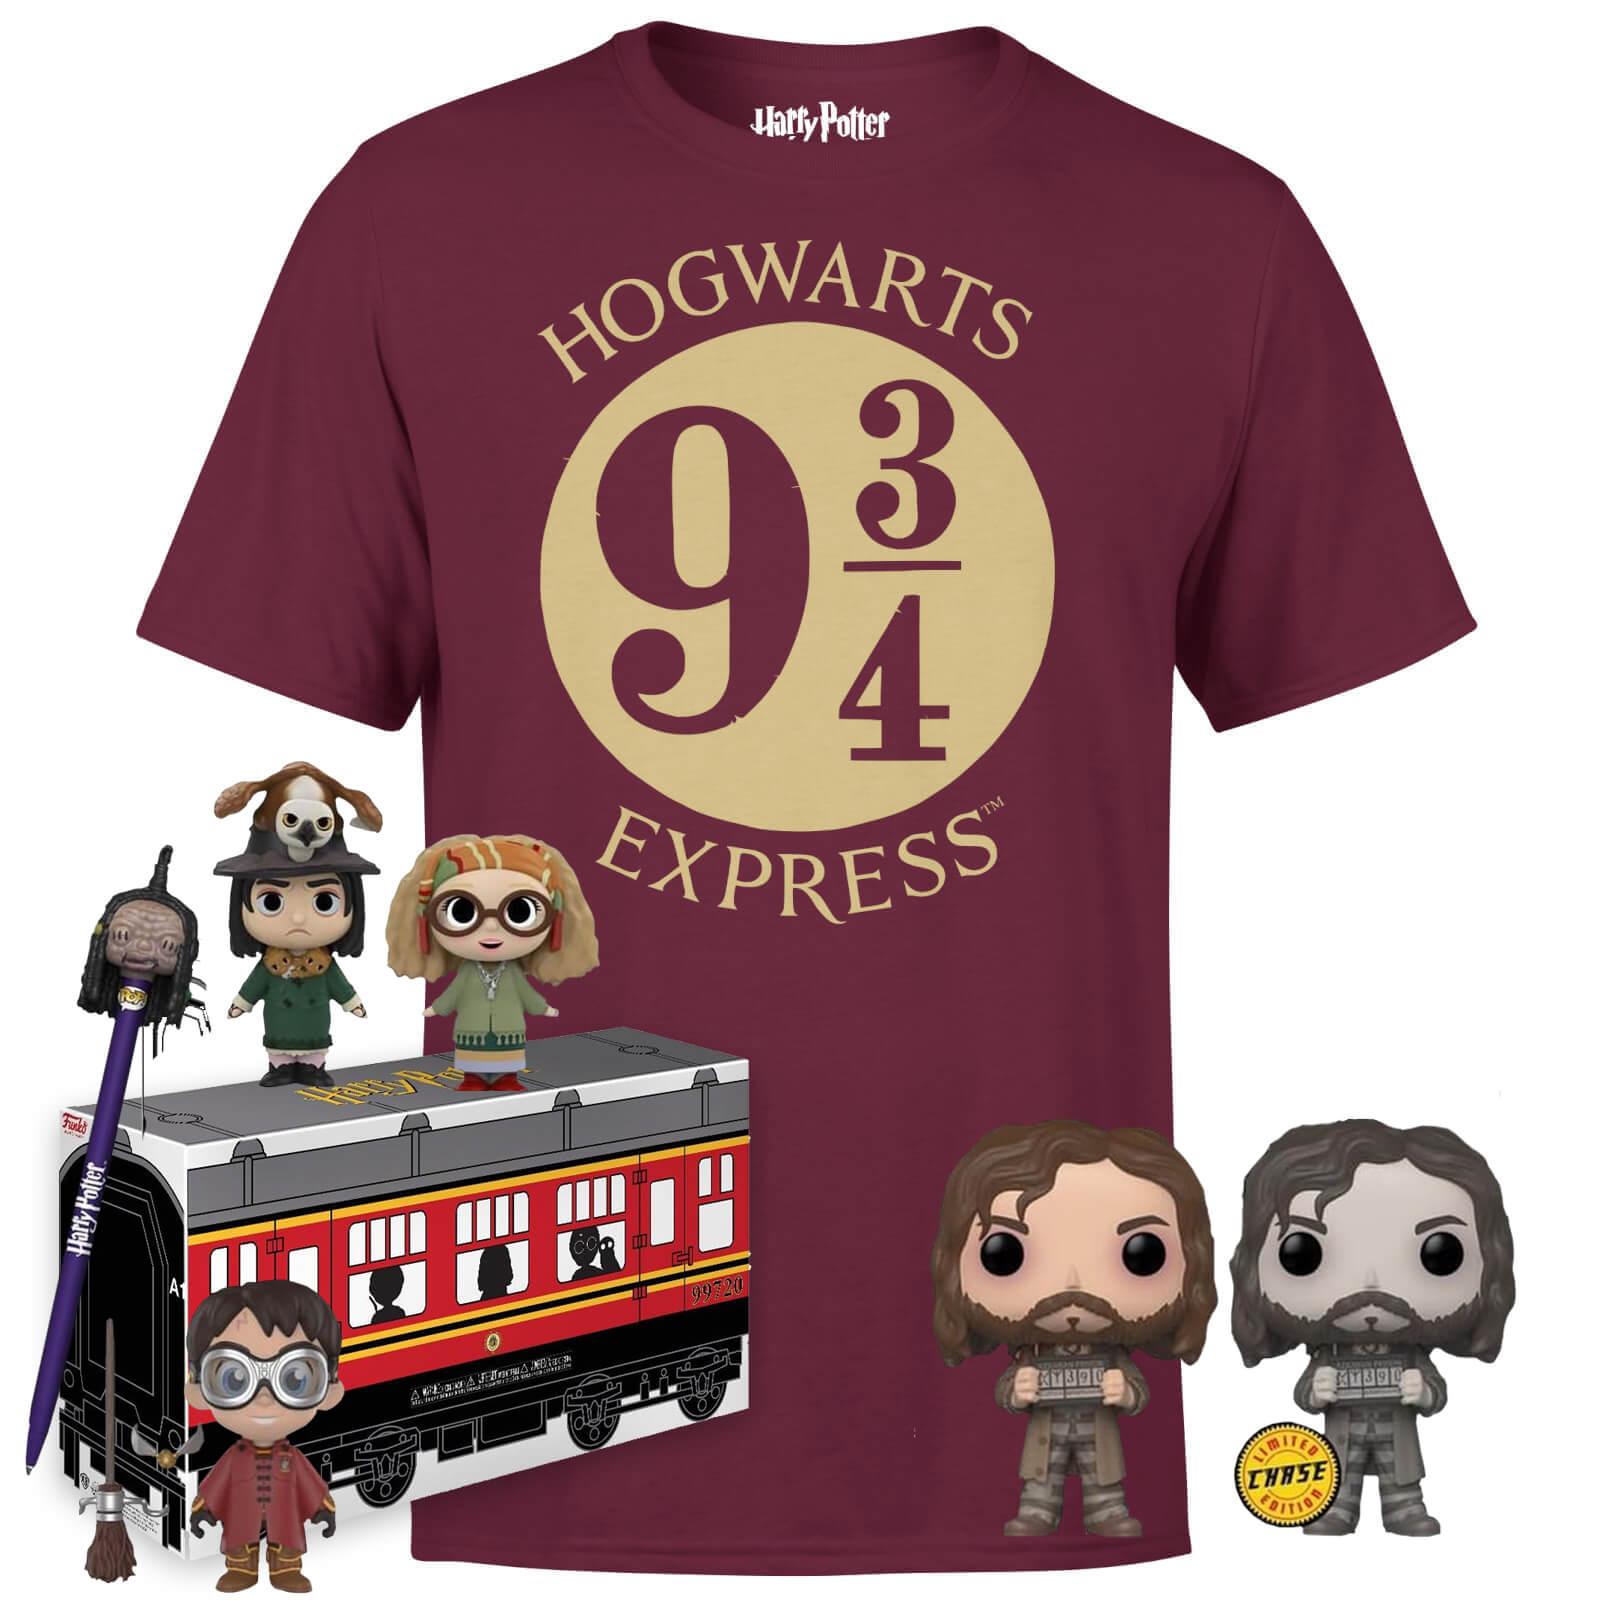 diseño novedoso Tienda online diseño popular Pack Harry Potter Camiseta + Funkos 33.4€ - chollometro.com